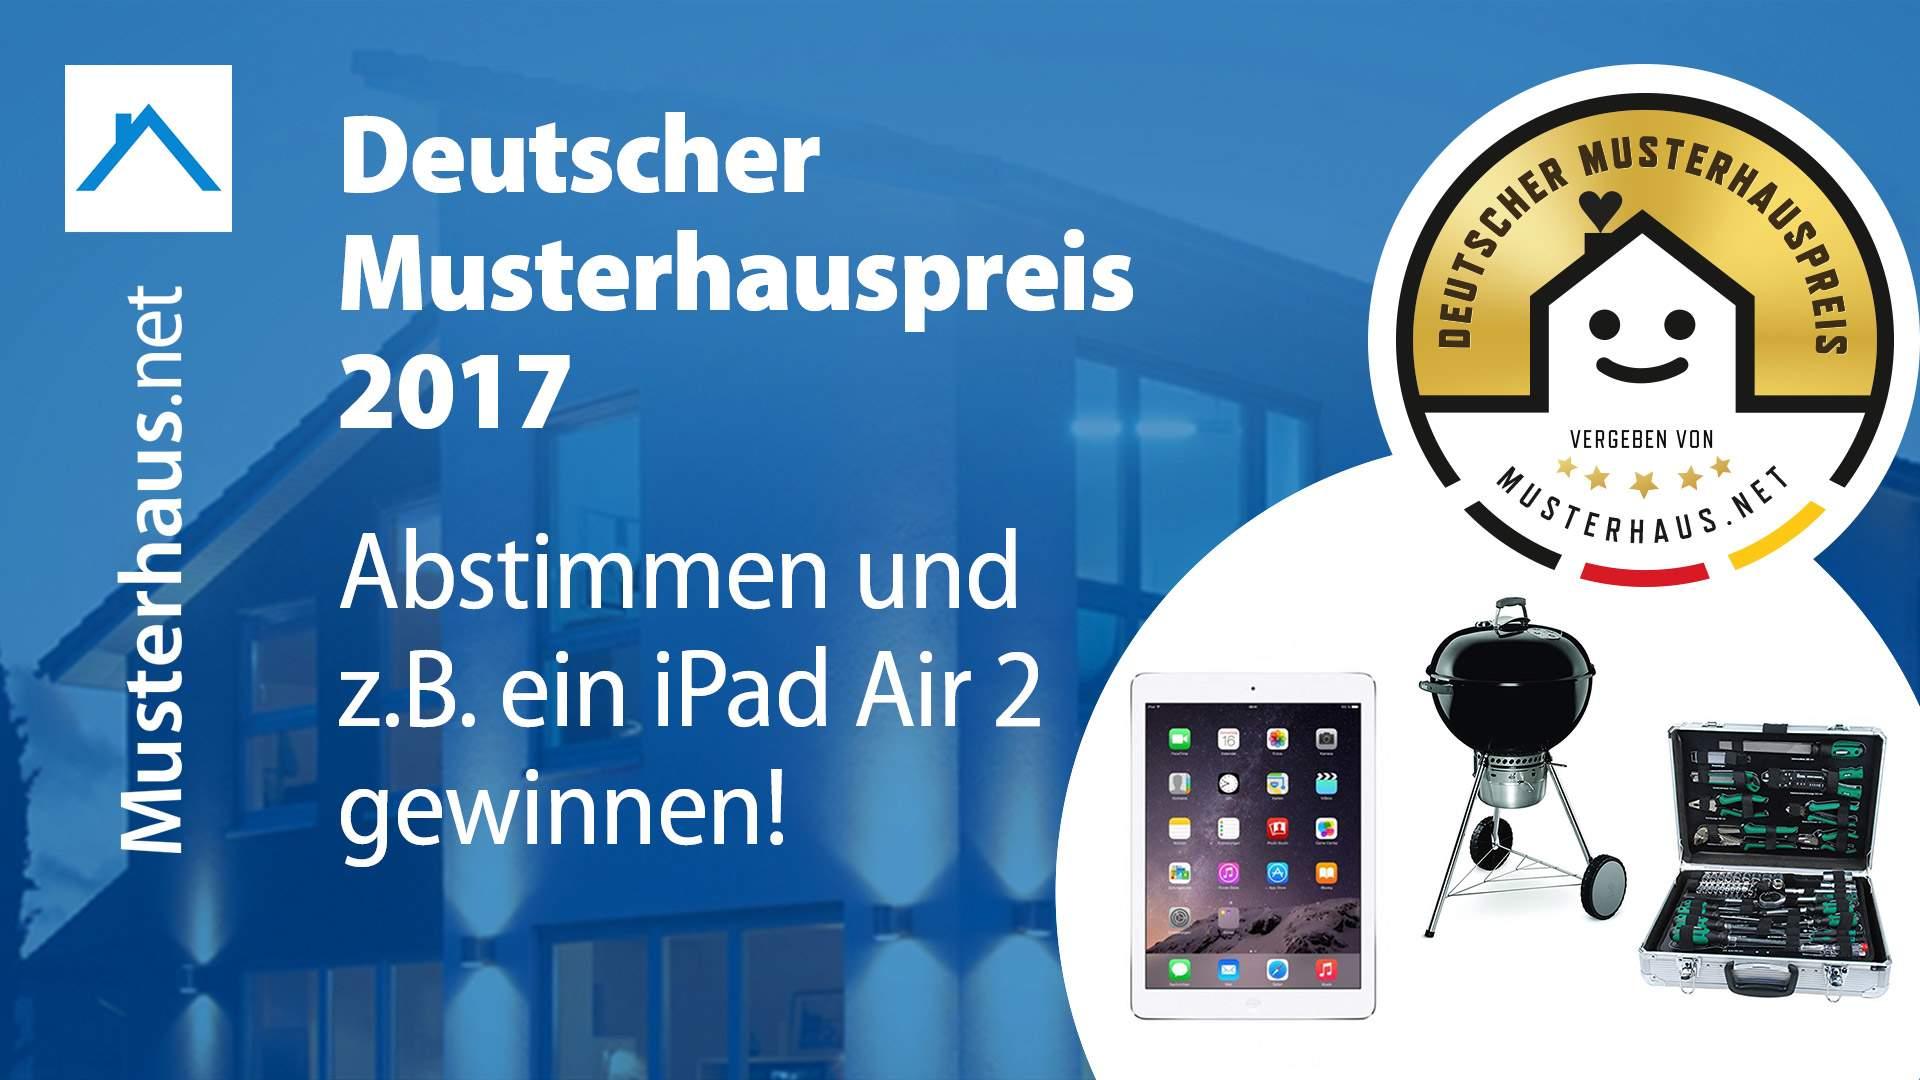 Deutscher Musterhauspreis Gewinnspiel